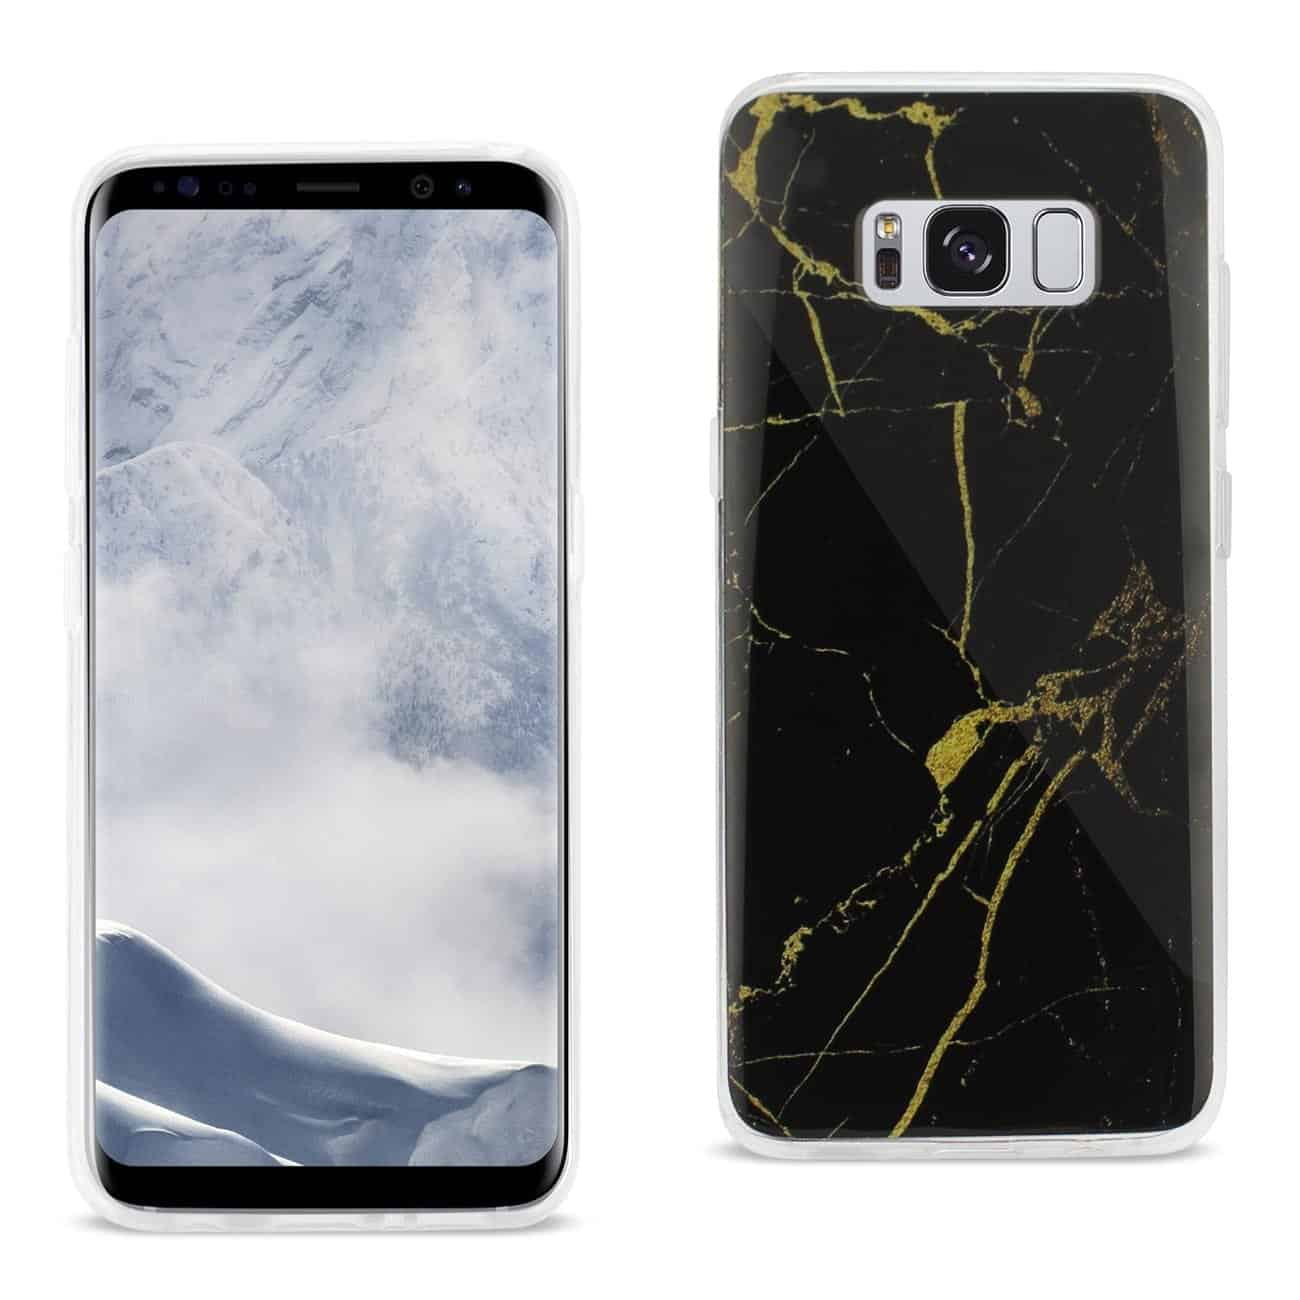 SAMSUNG GALAXY S8 EDGE/ S8 PLUS STREAK MARBLE IPHONE COVER IN BLACK